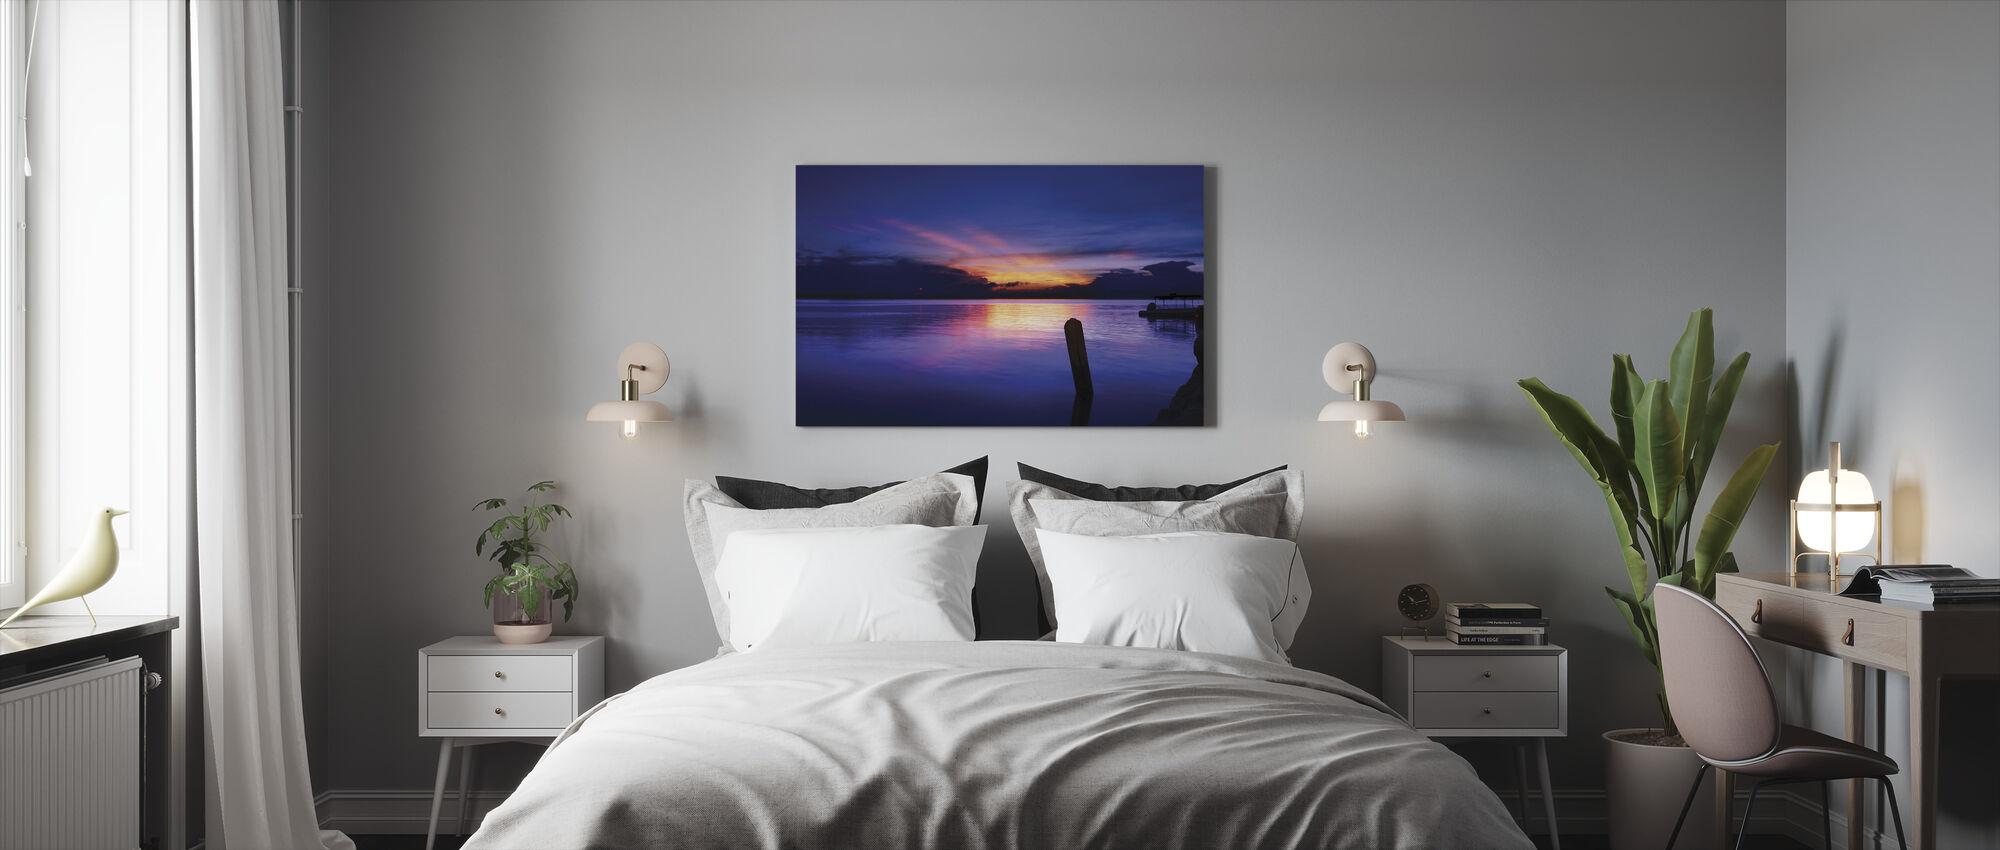 Sunrise at Sta Ana - Canvas print - Bedroom